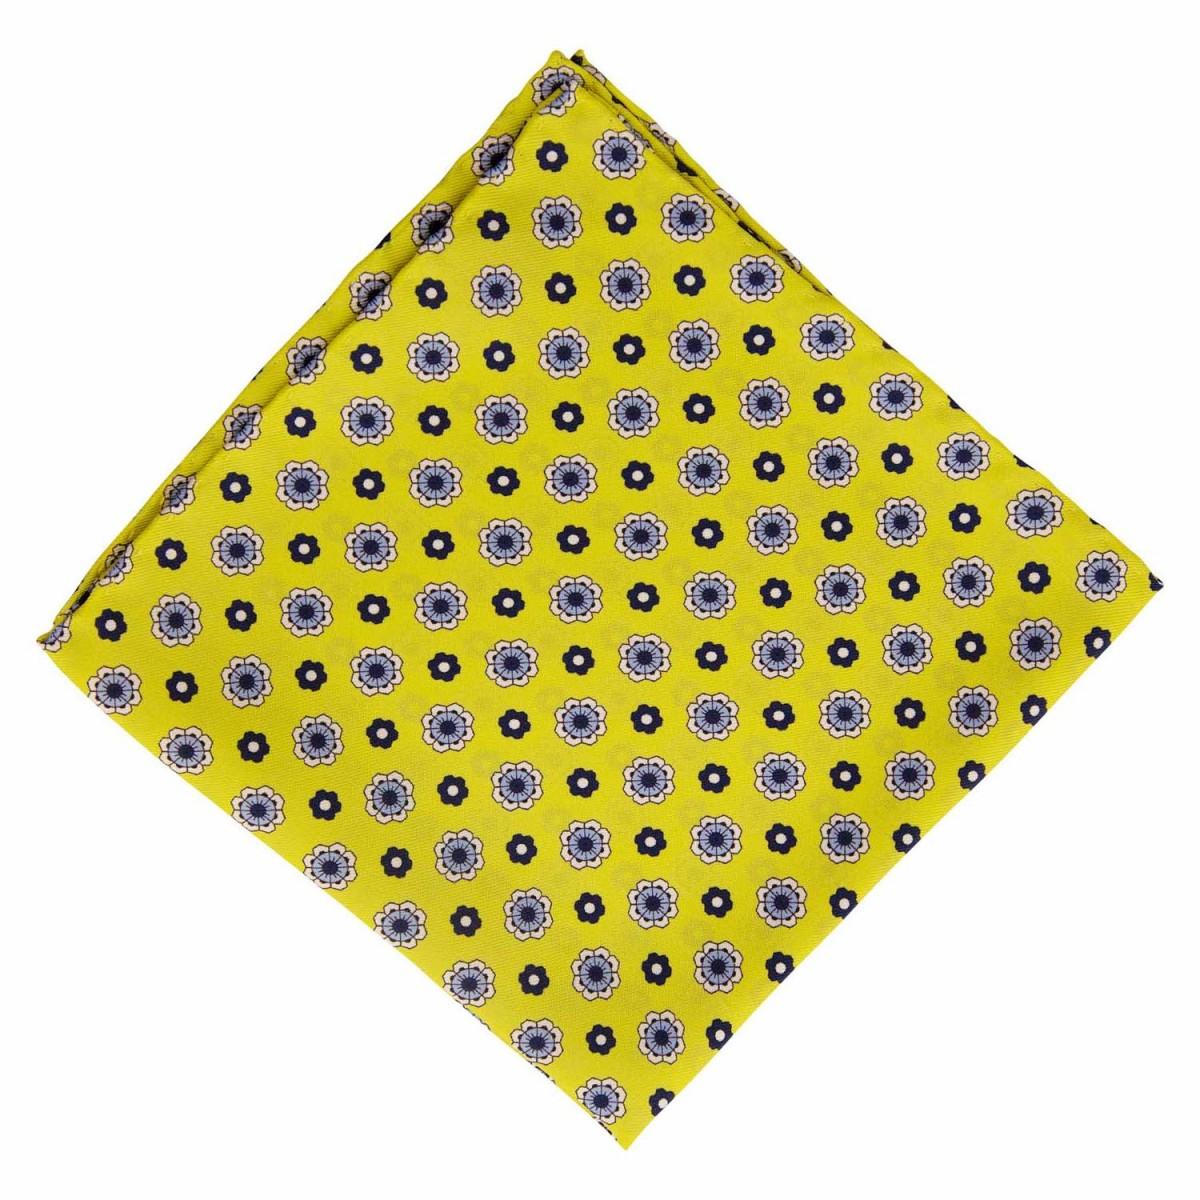 Panuelo-Amarillo-Dibujos-Azules